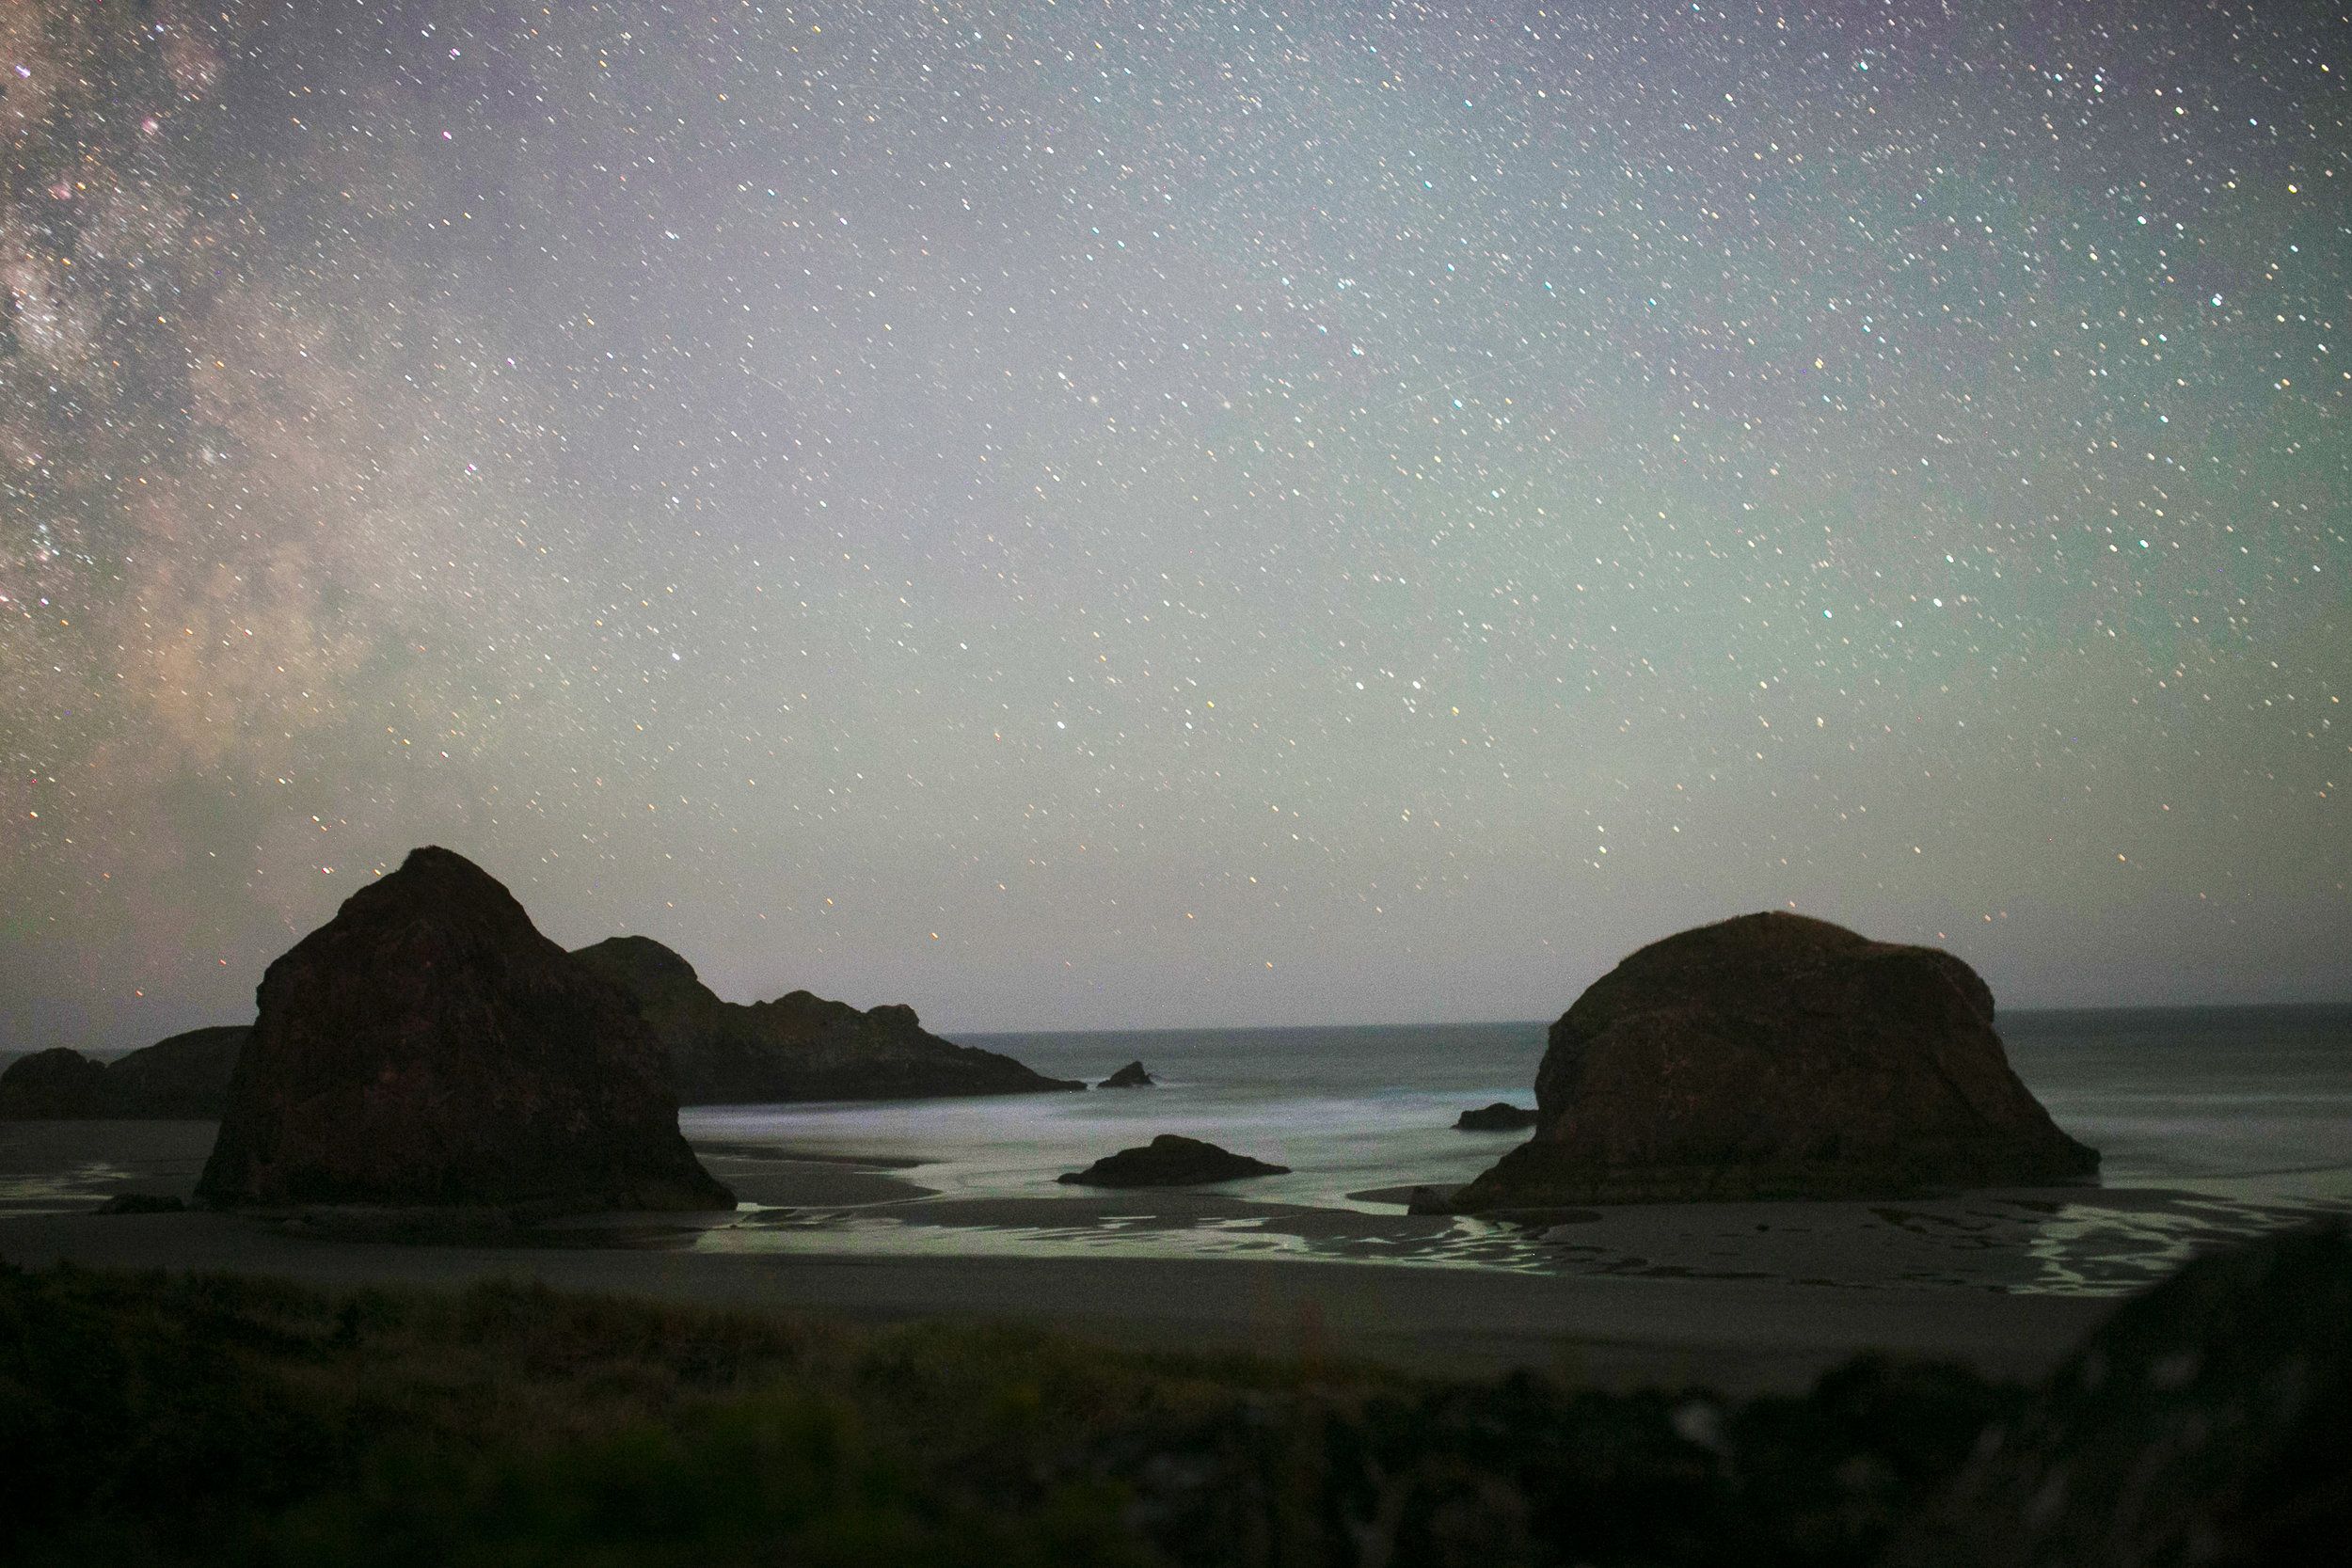 083Travel_Adventure_Outdoor_Photography_Outlive_Creative_Oregon_Night_Stars.jpg